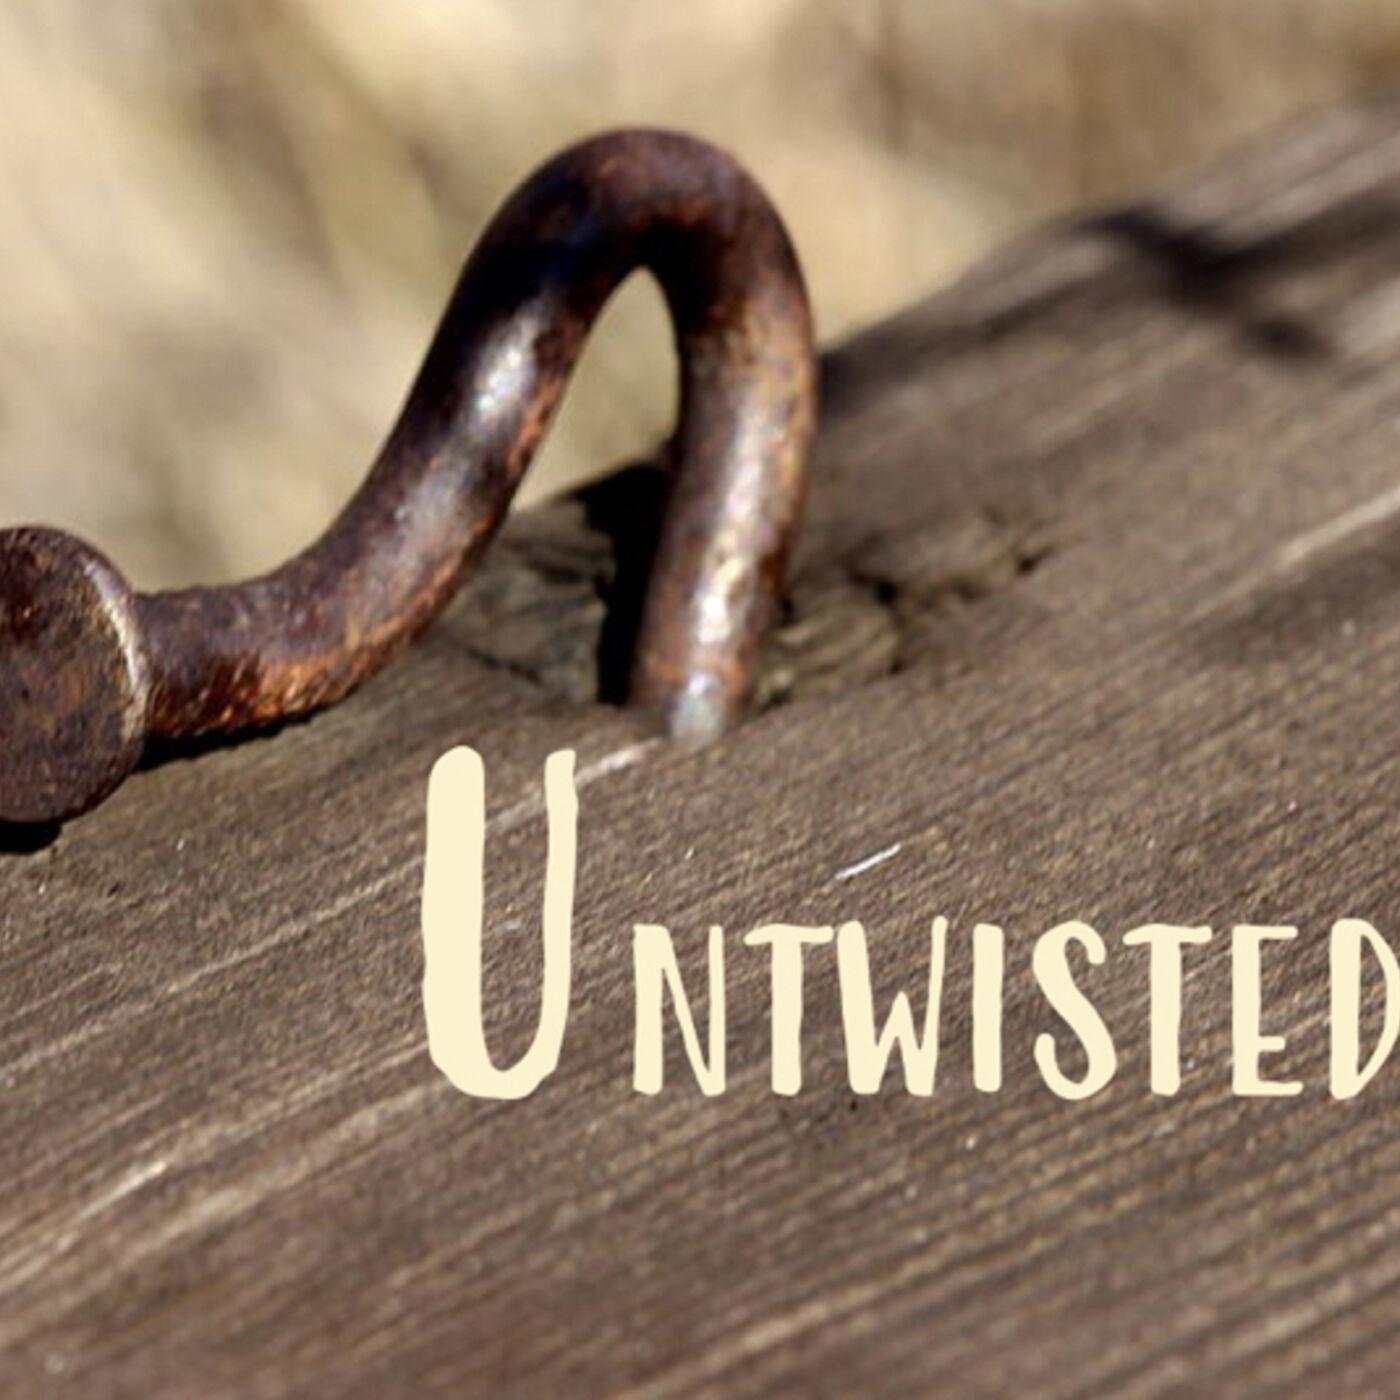 Untwisted: Destiny